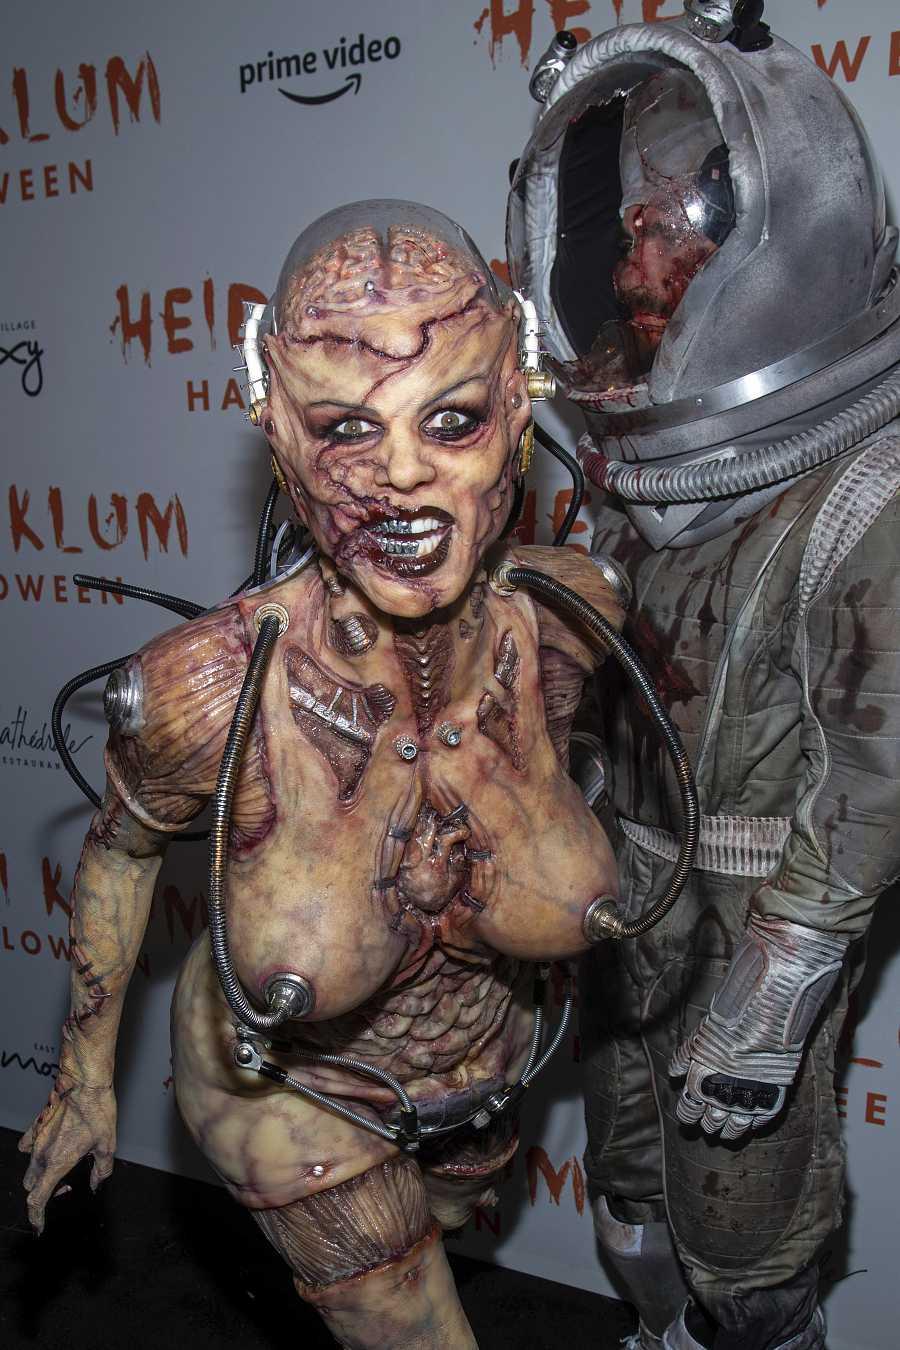 eidi Klum y su novio, Tom Kaulitz, siempre las estrellas de la fiesta